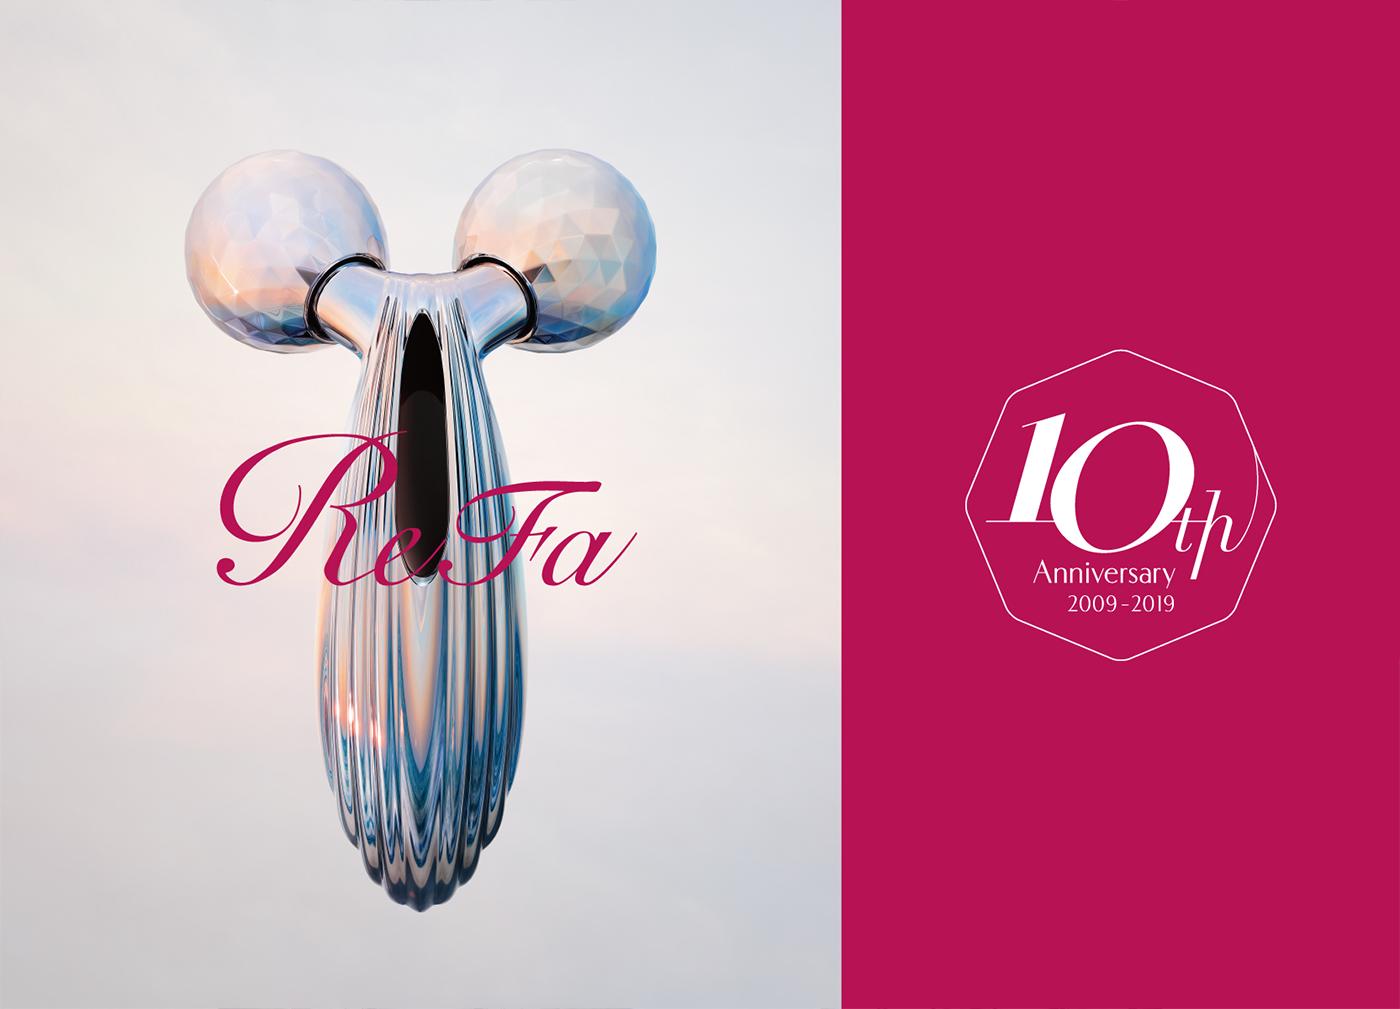 Beauty Brand ReFa Turns 10 in February 2019.